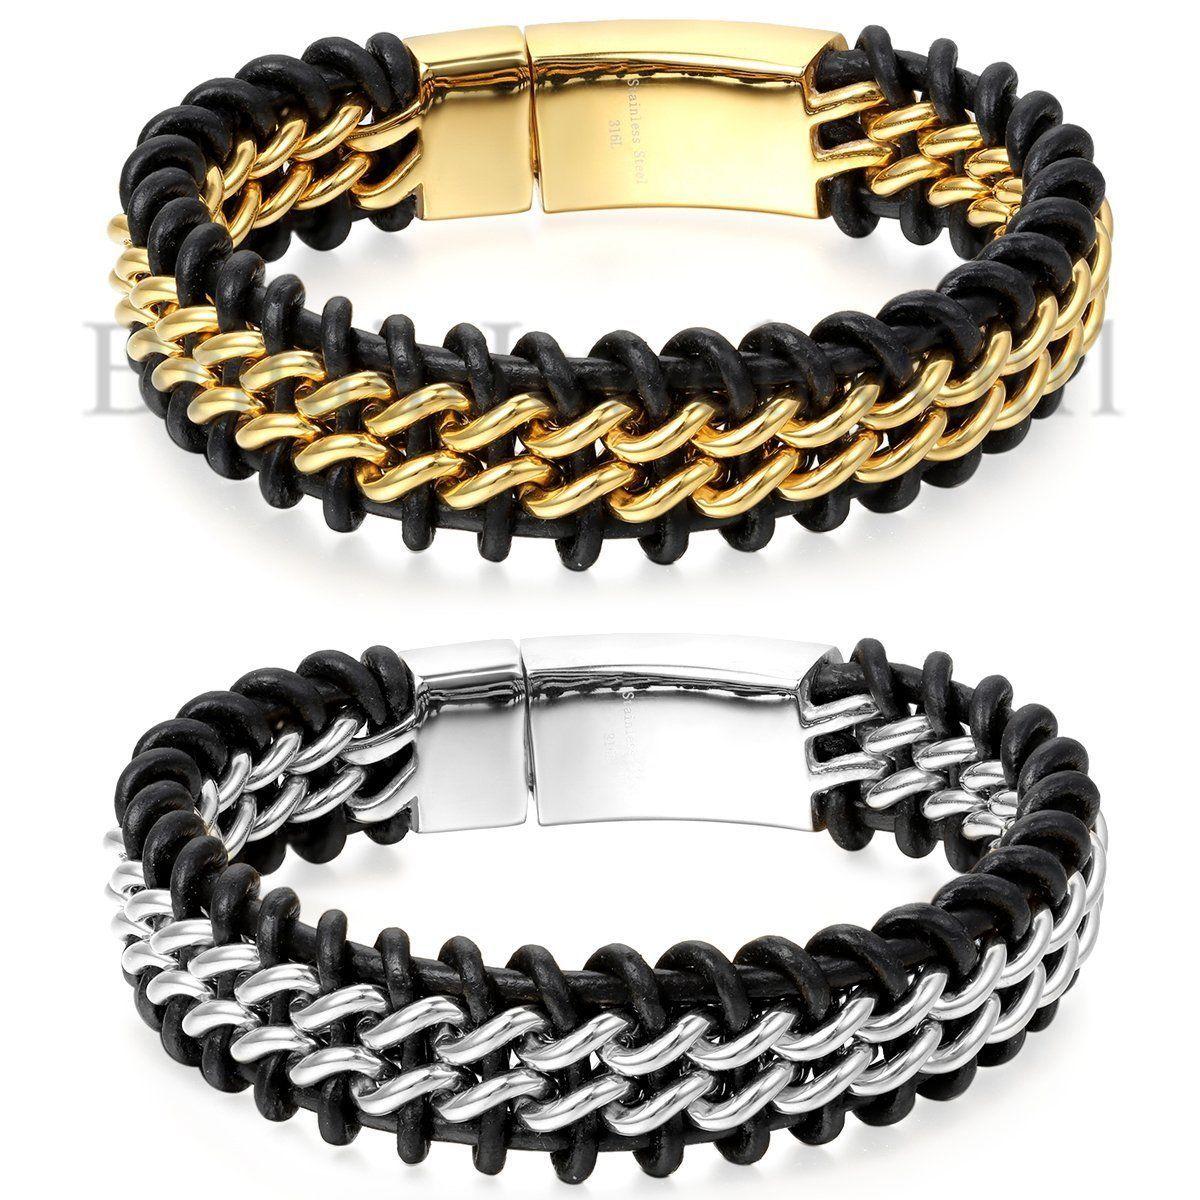 MEN/'s Trendy Genuine Black Braided Leather Stainless Steel Curb Chain Bracelet